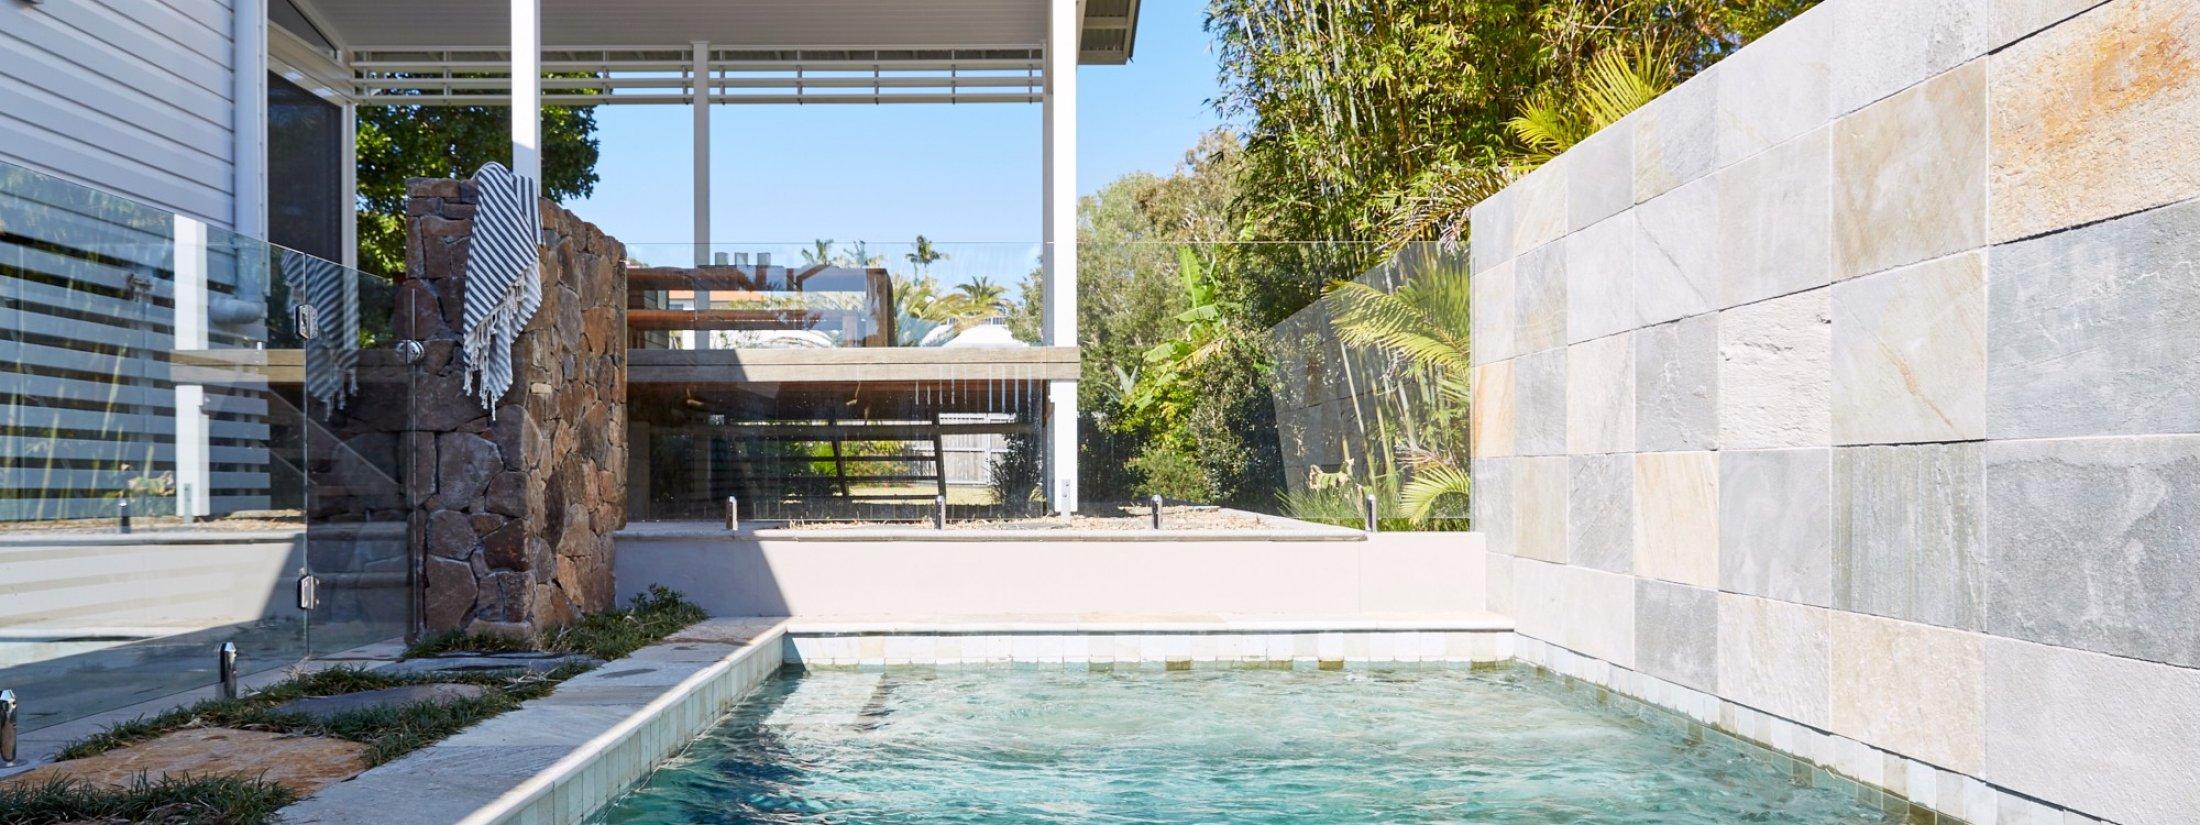 Belletide - Byron Bay - new heated pool